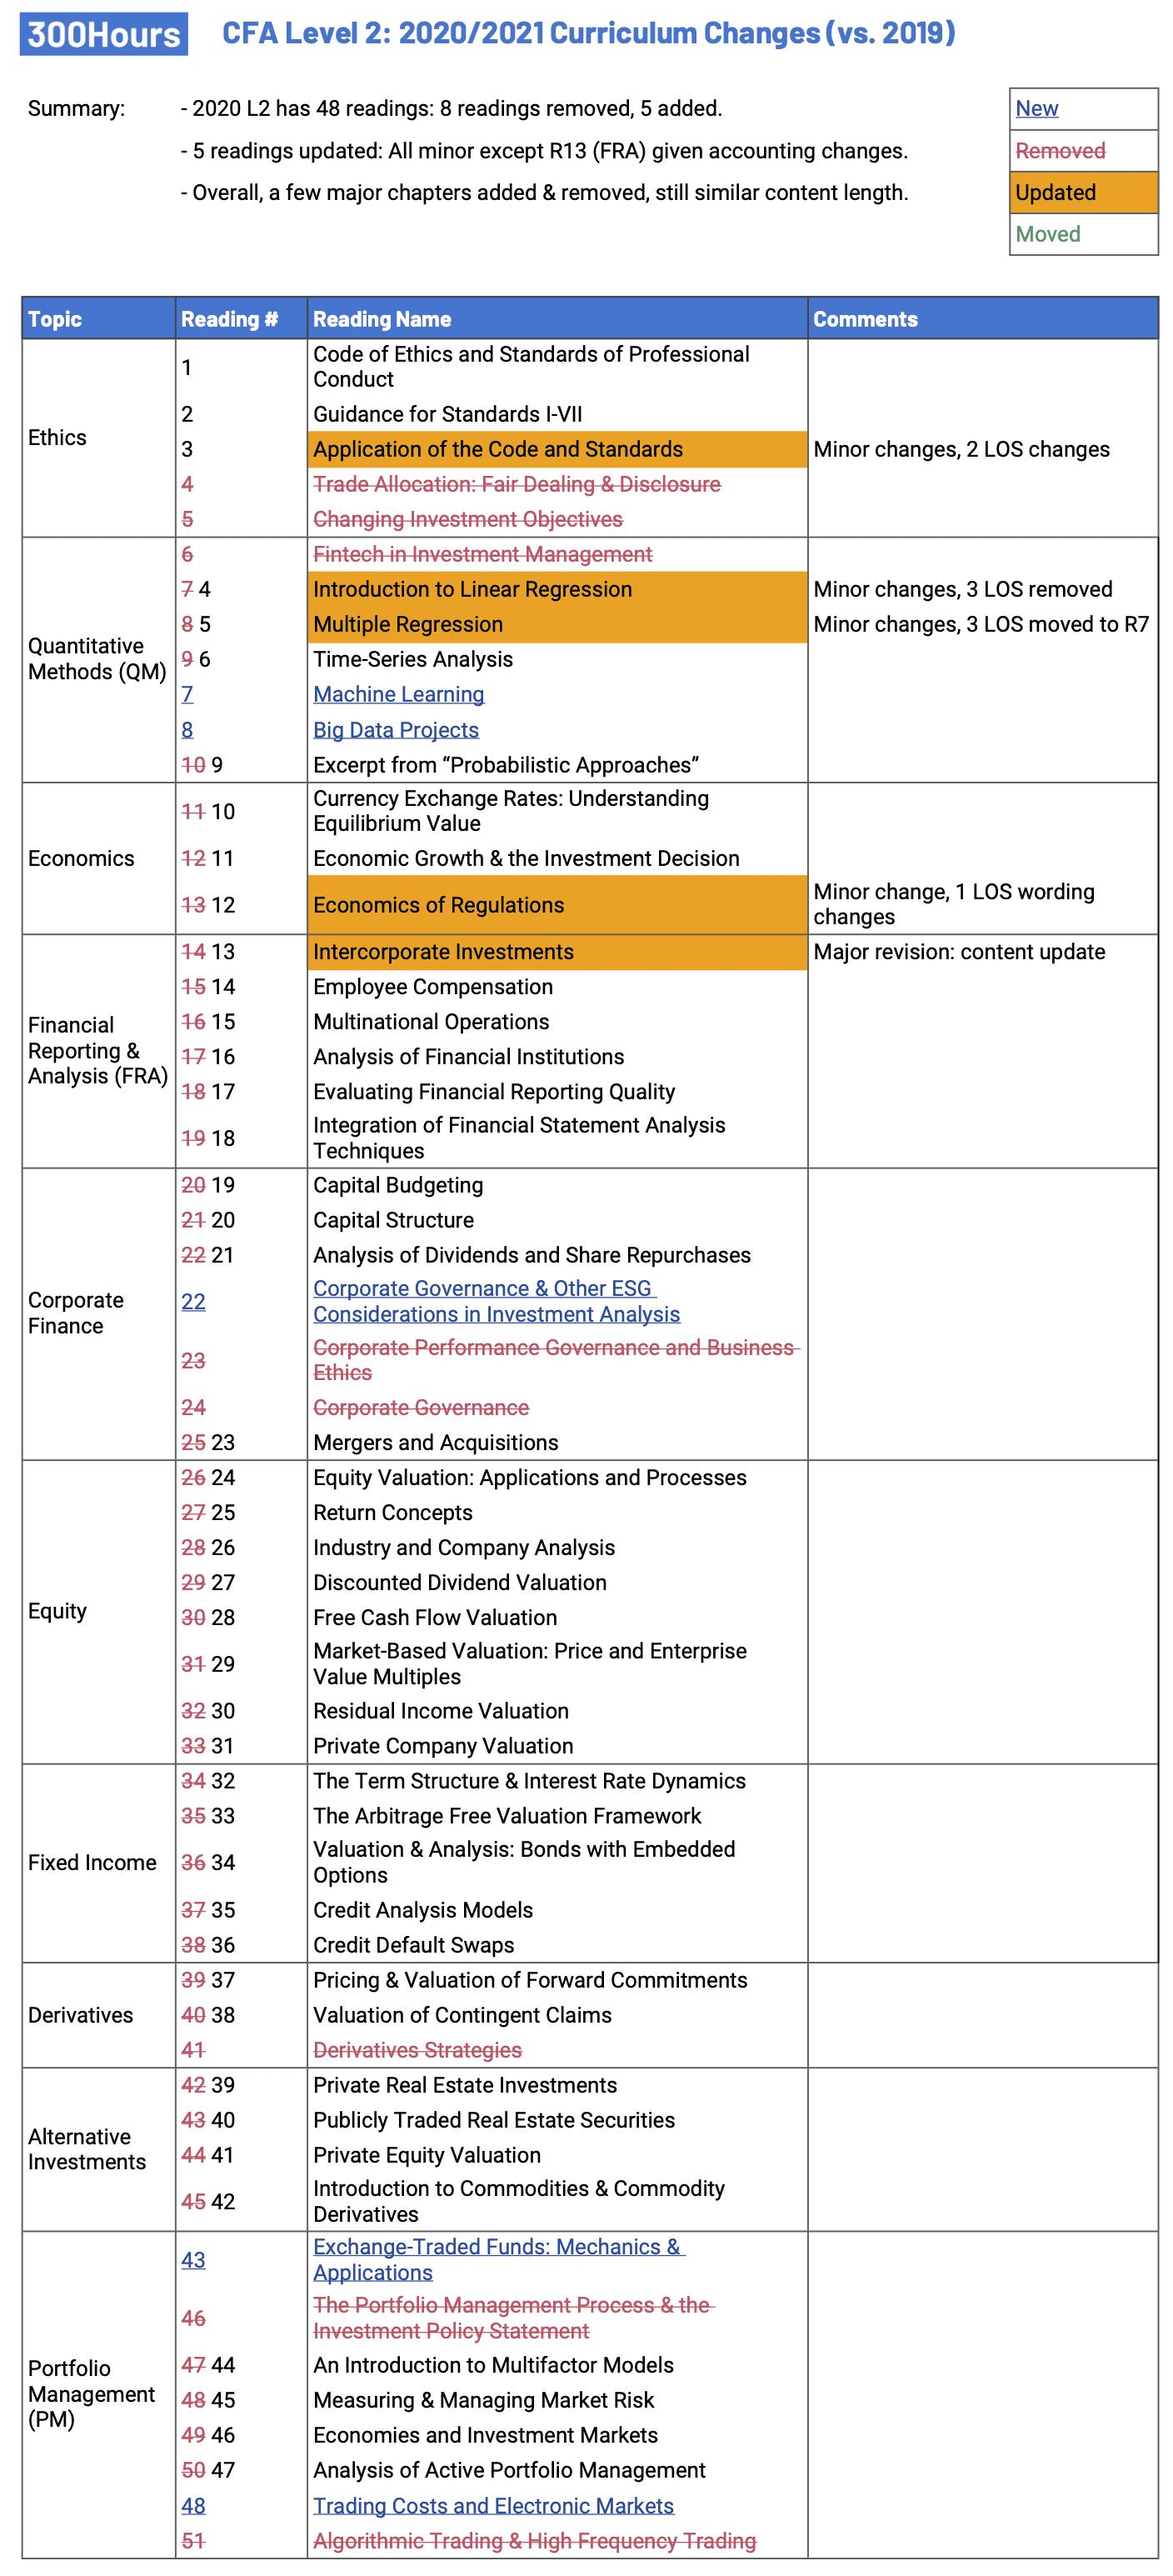 CFA Level 2 Curriculum Changes Summary